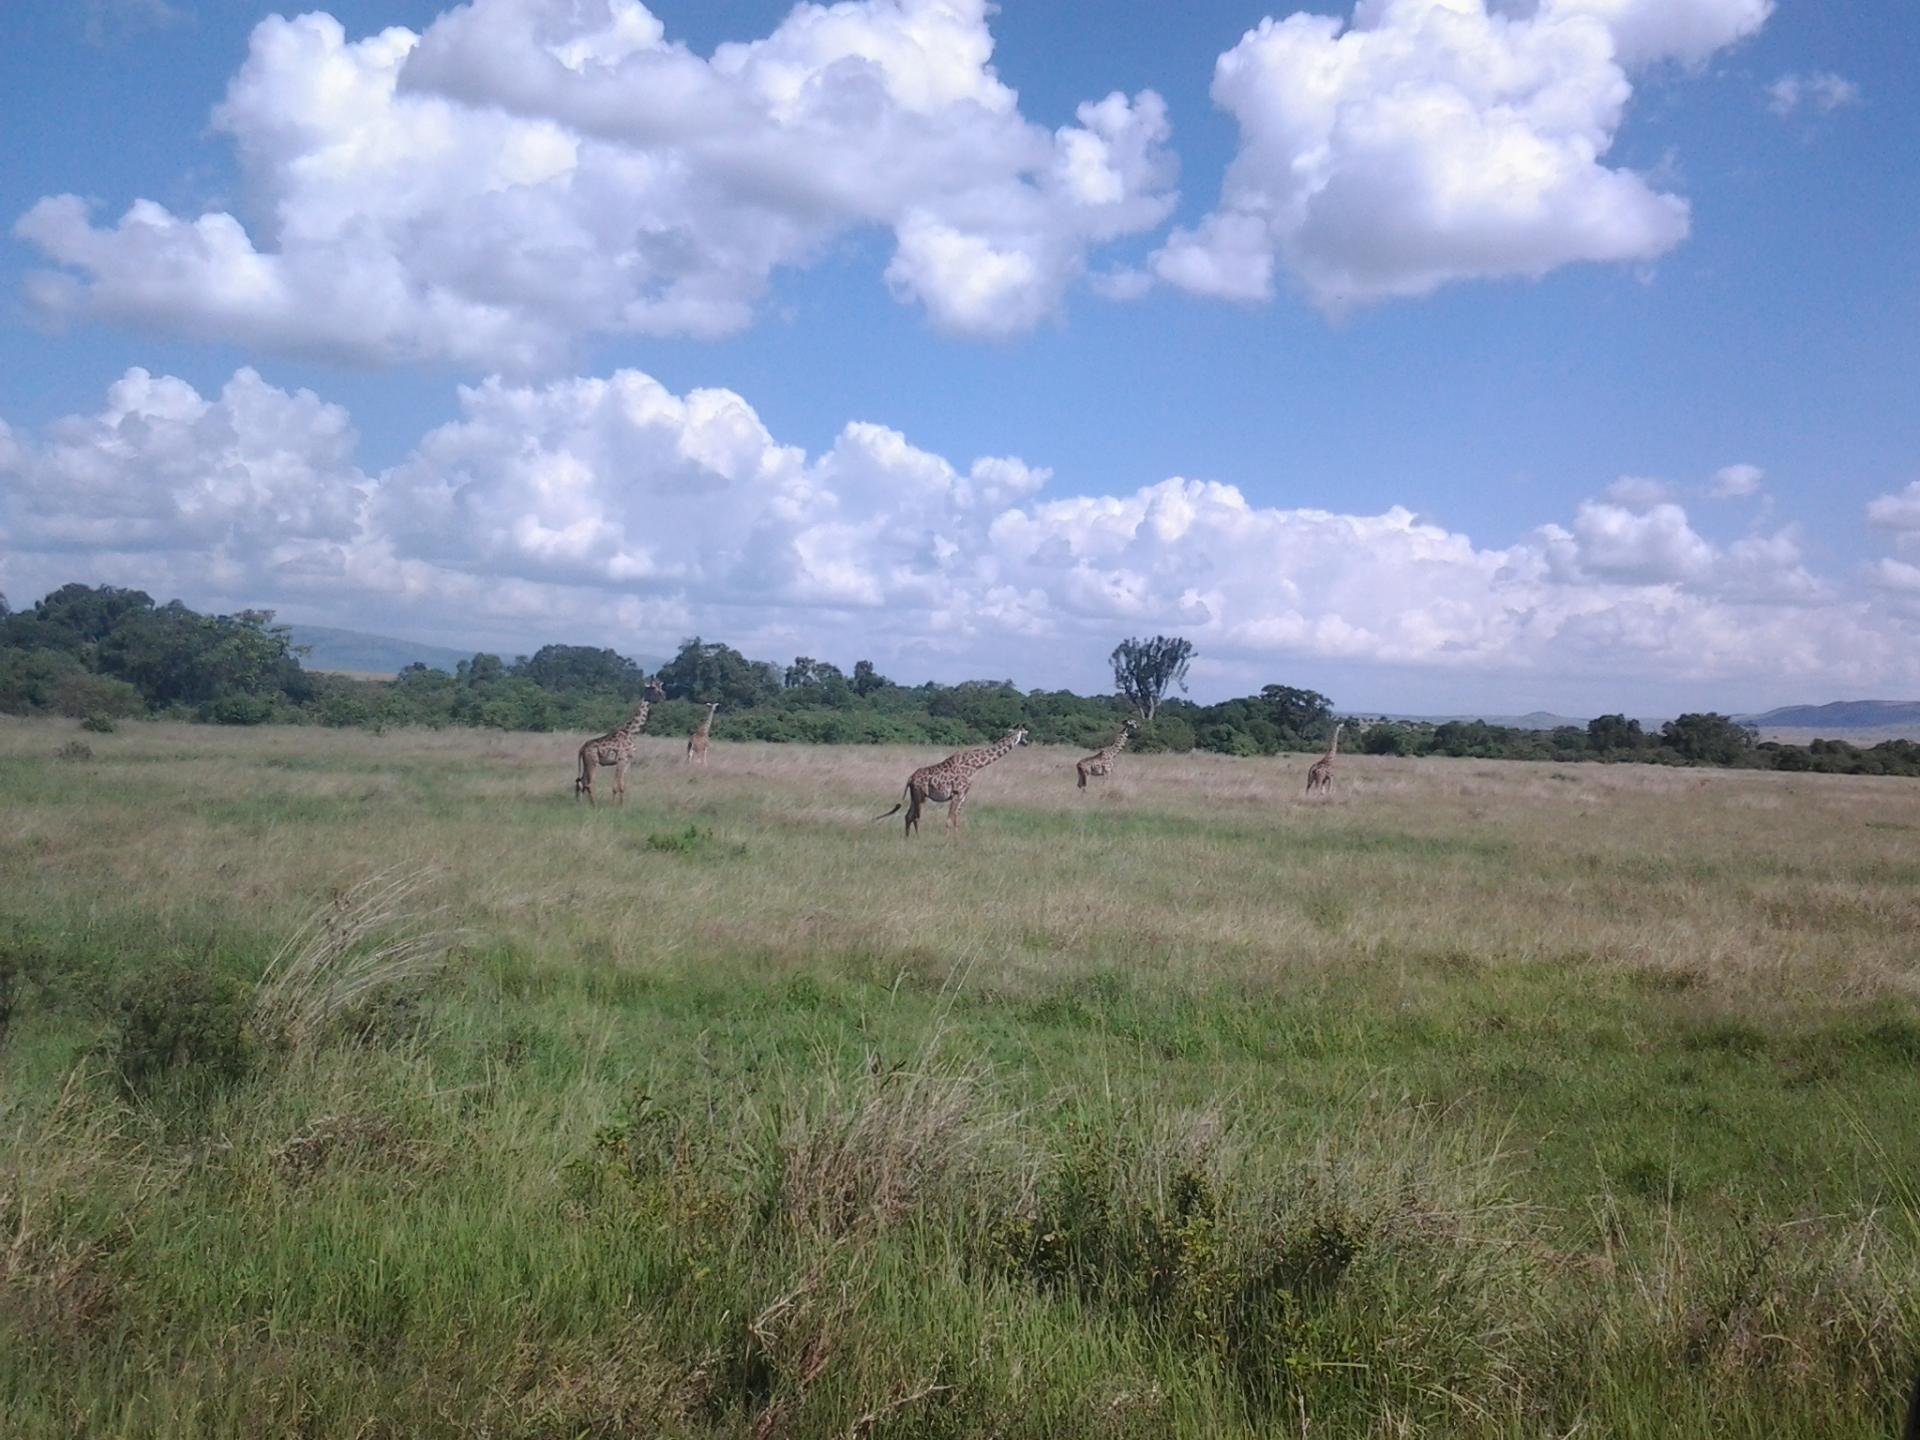 Kenya Tanzania Adventure Budget Camping Safari, YHA Kenya